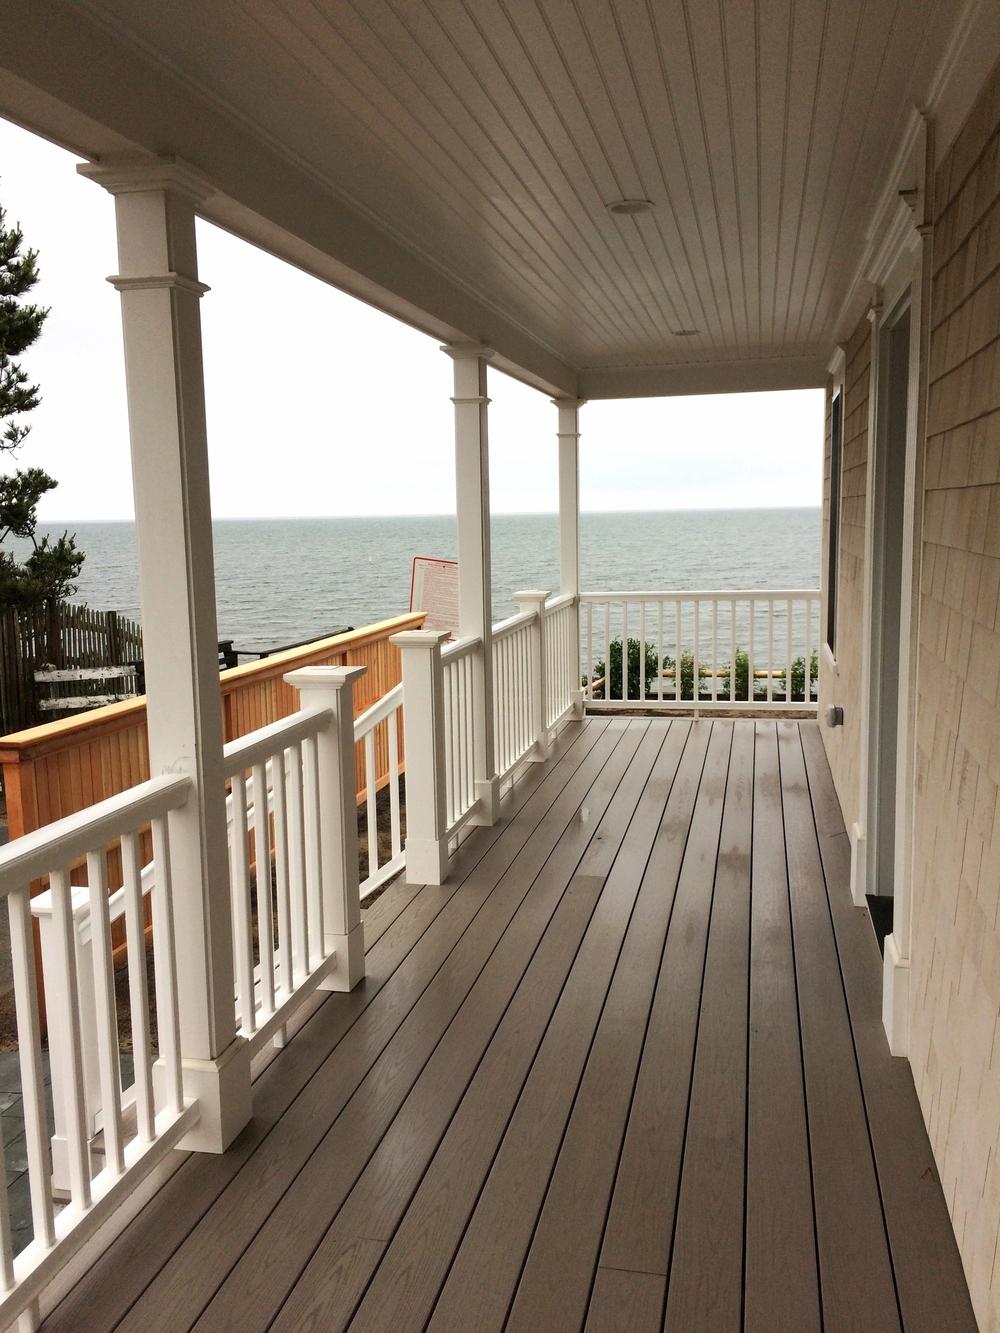 P-L Front Porch View.jpg